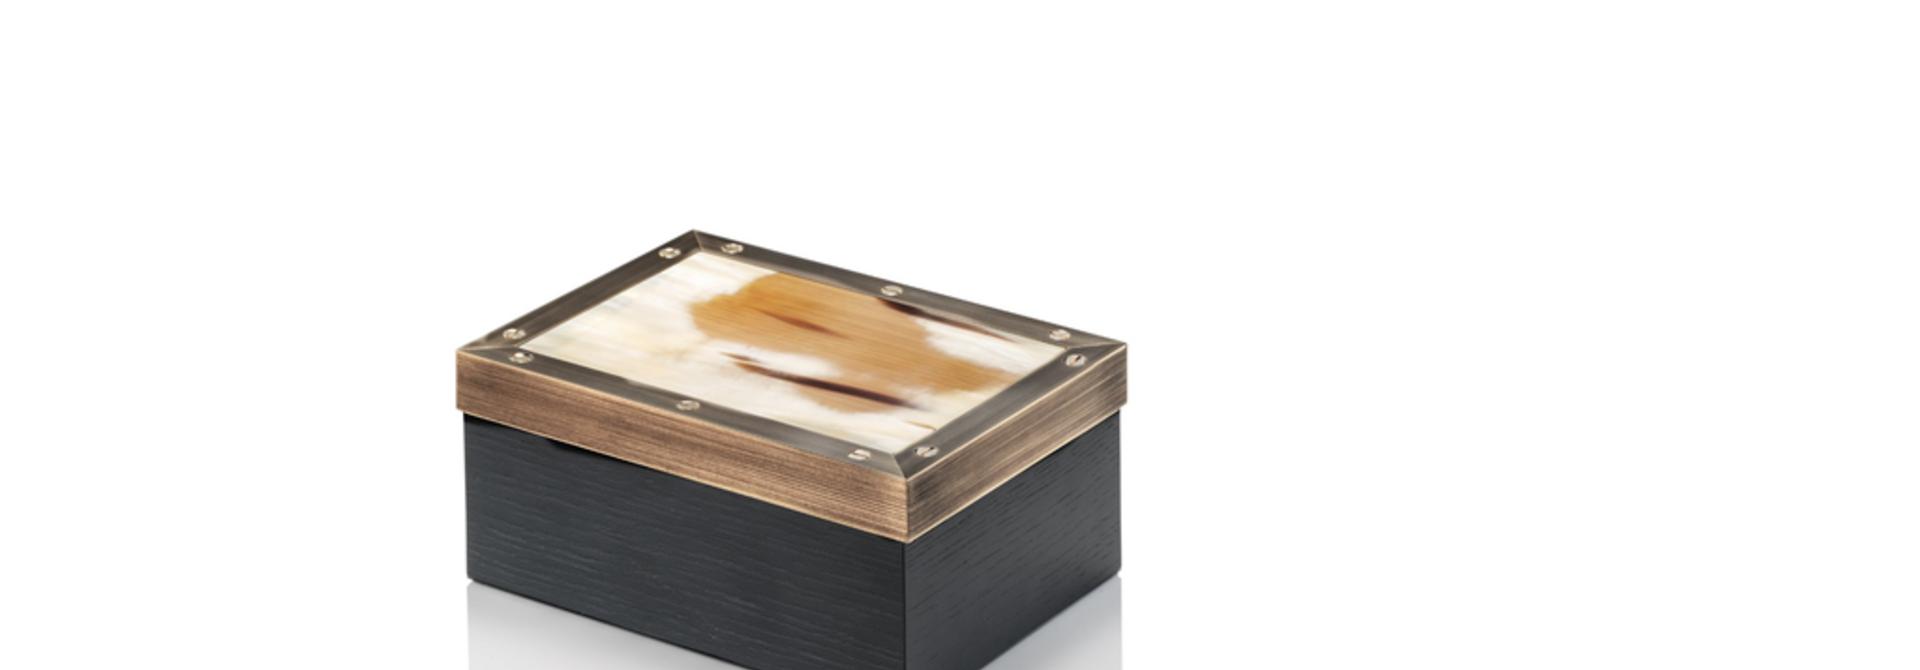 ARCAHORN - Zefiro Black Box